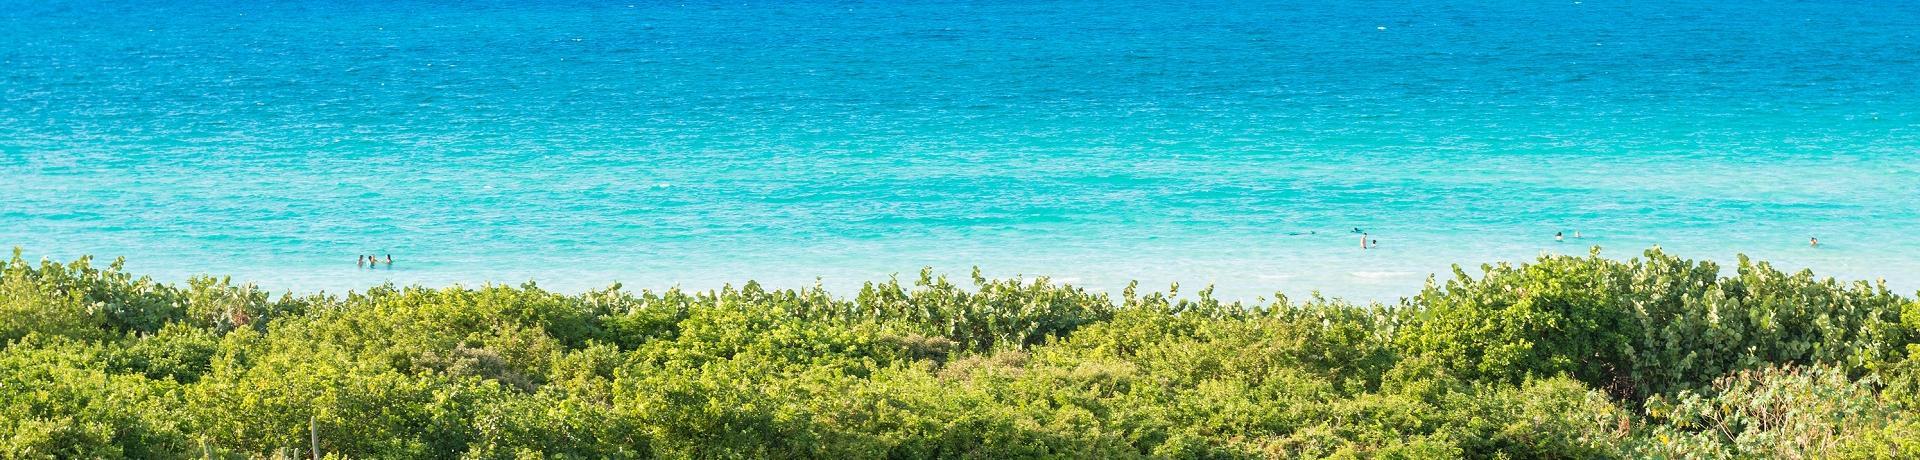 Kuba: Strand - Emotion